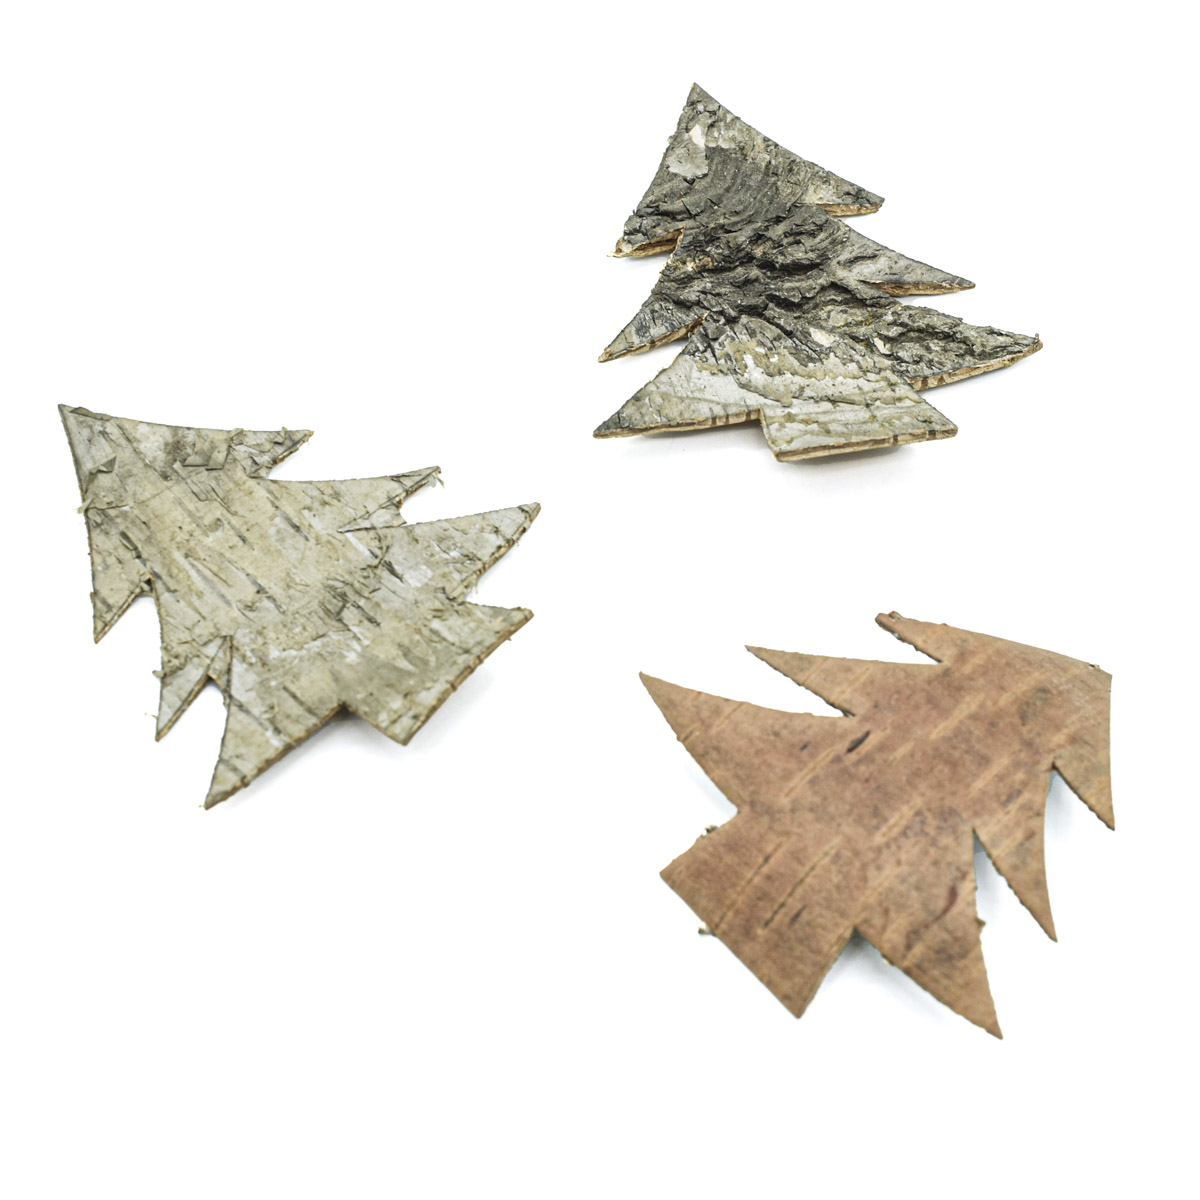 YW021 Декоративные элементы из коры дерева 'Елочки', 10см, 3шт/уп